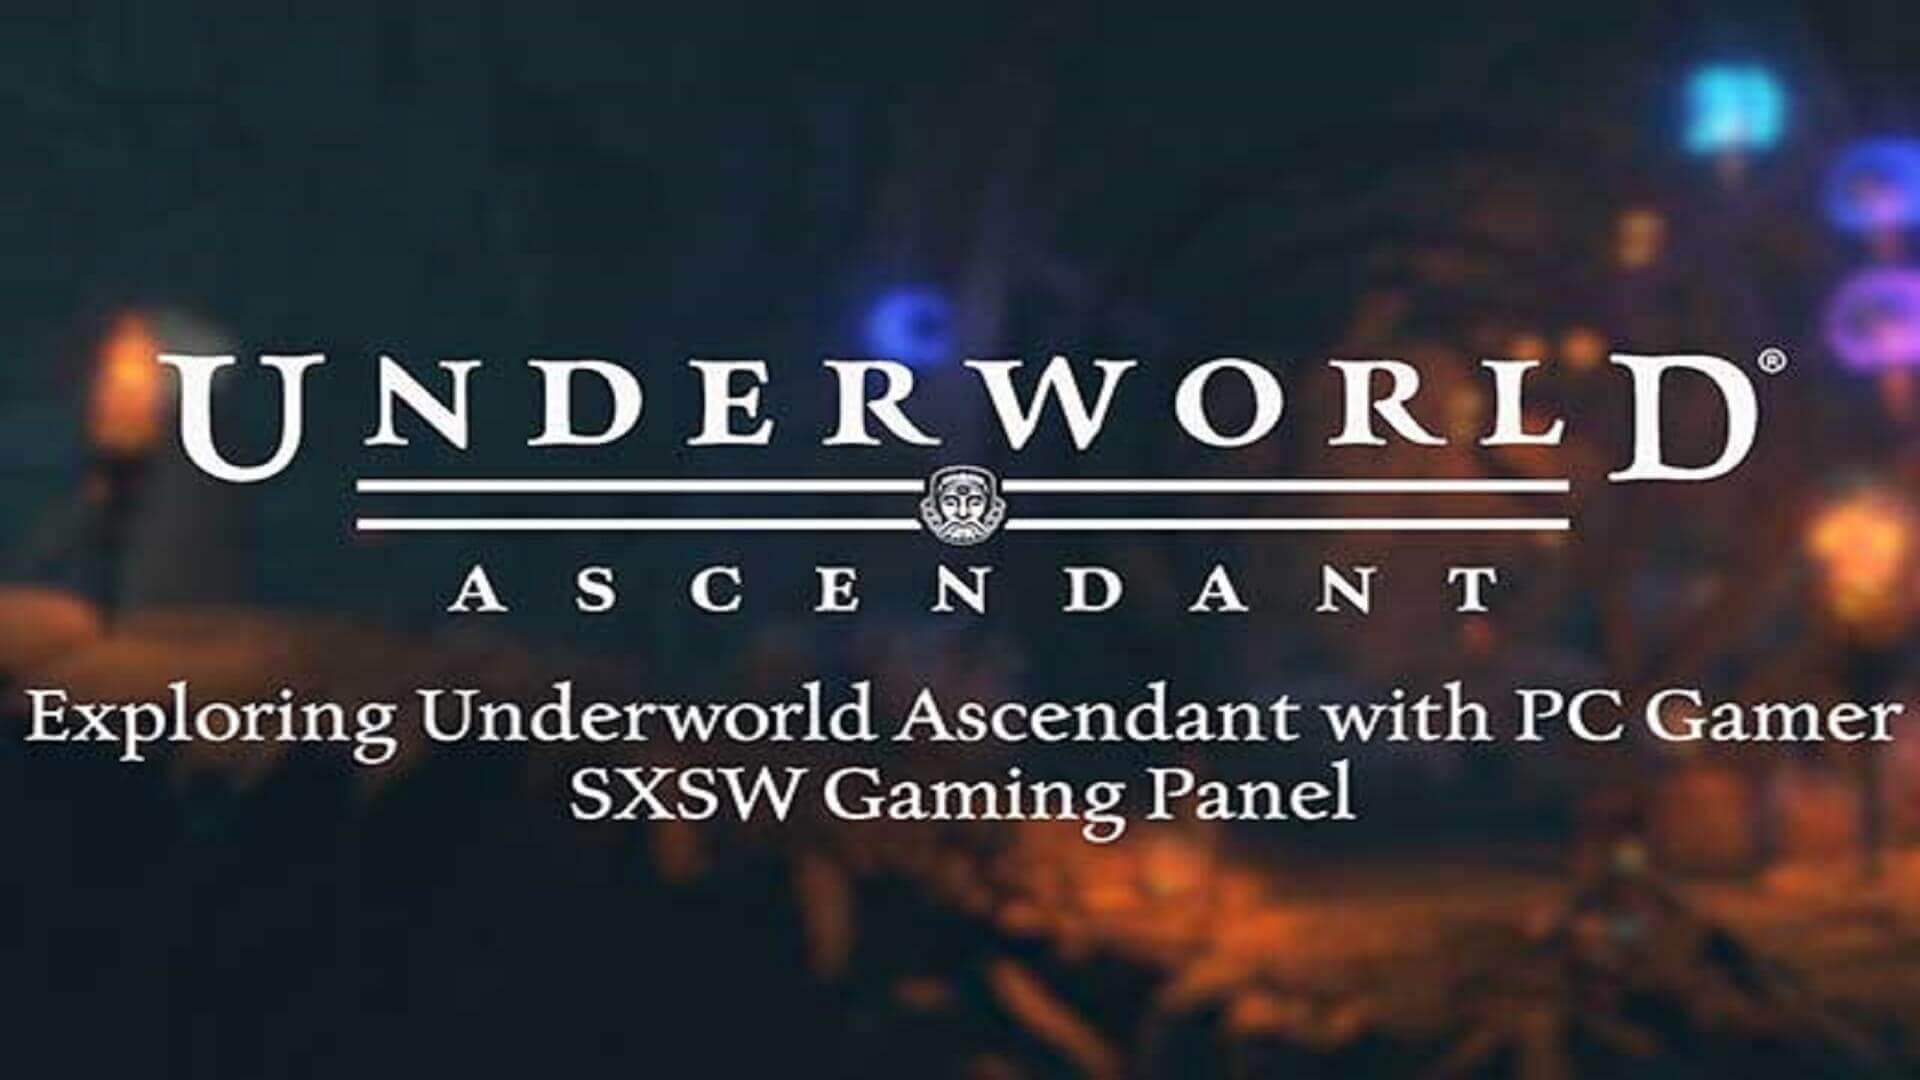 SXSW Gaming Panel